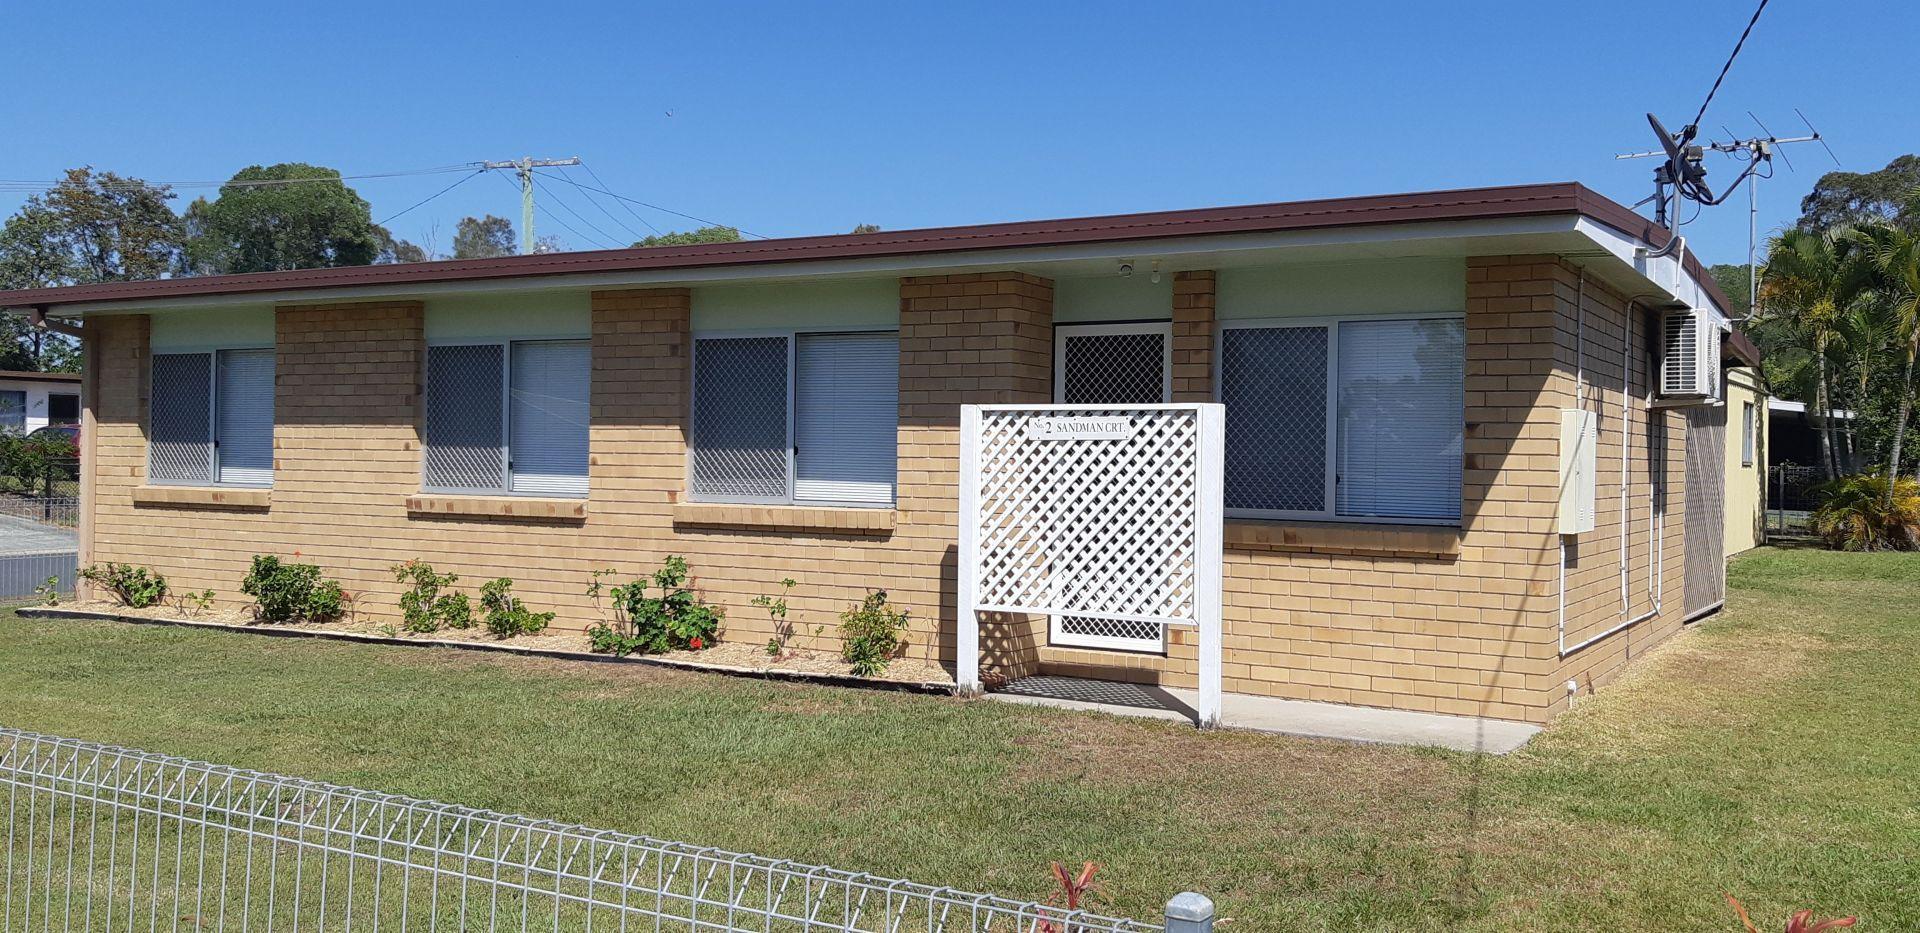 2 Sandman Court, Deception Bay QLD 4508, Image 0